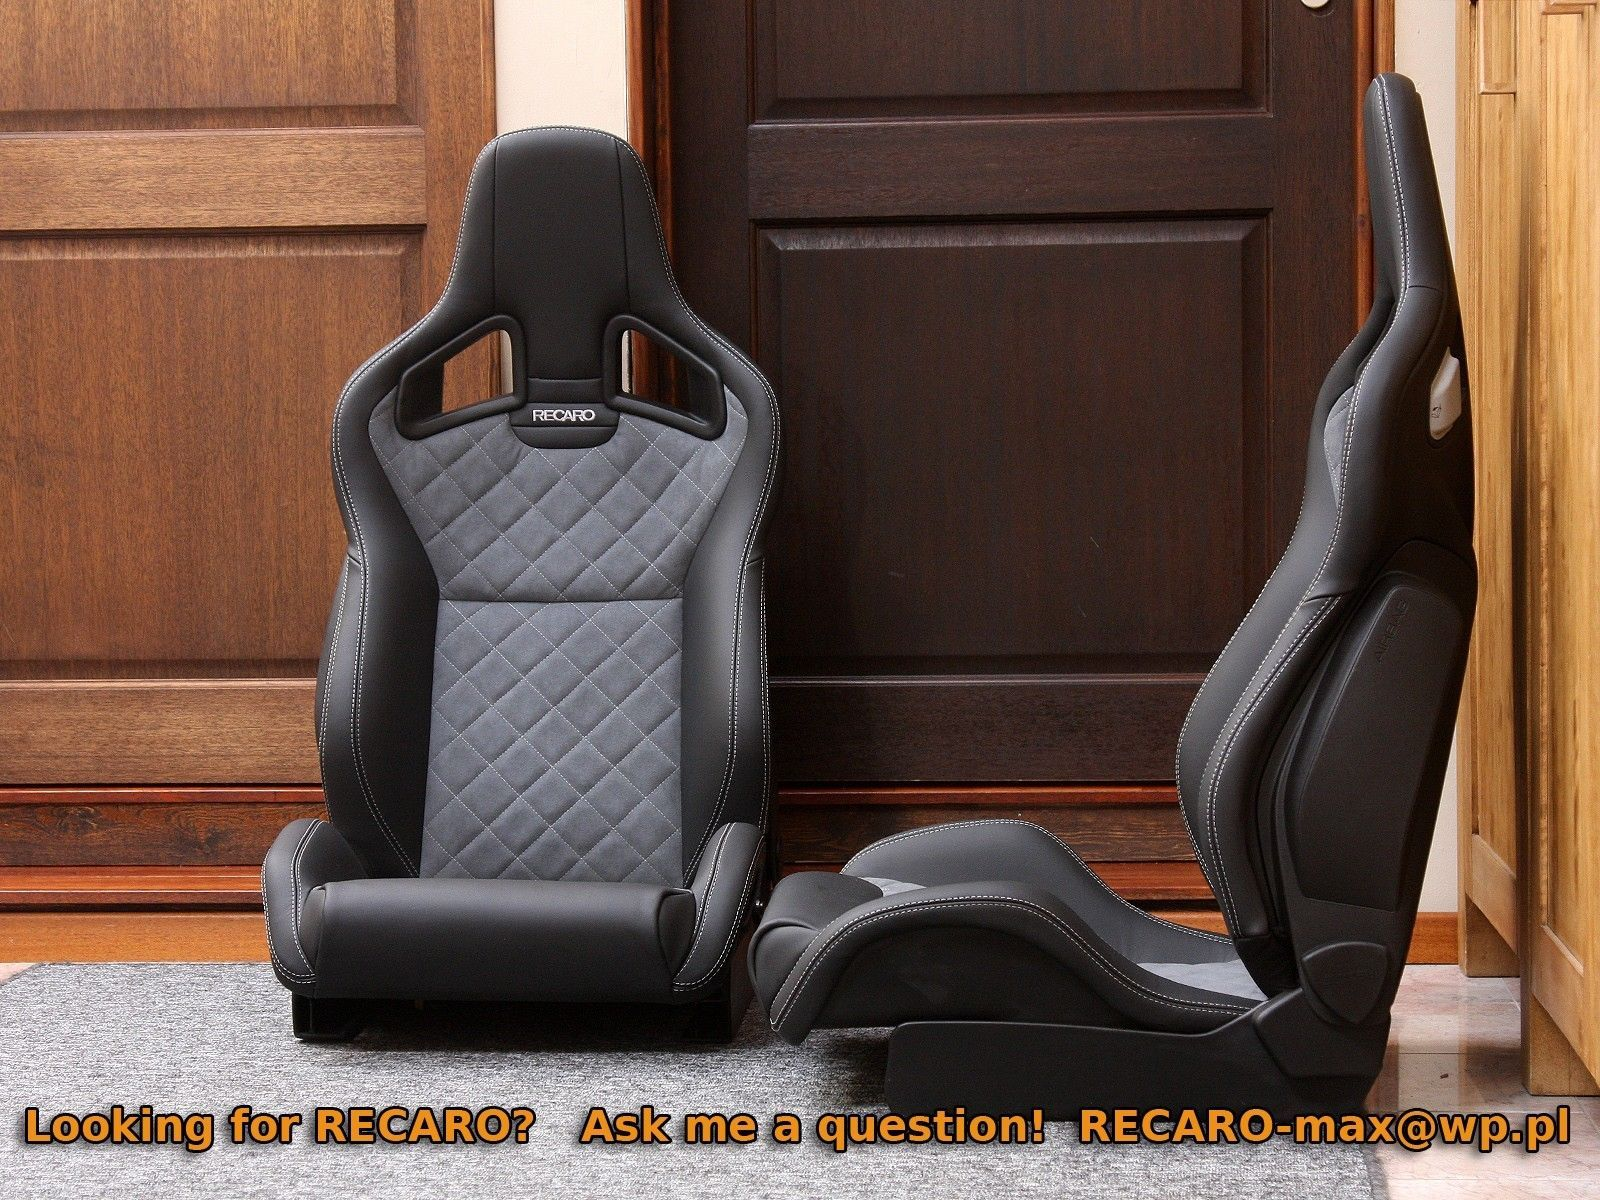 Recaro Sportster Cs Airbag Many Options Bmw Sti Evo Porsche Mustang R8 Etc Ebay Recaro Sportster Bmw